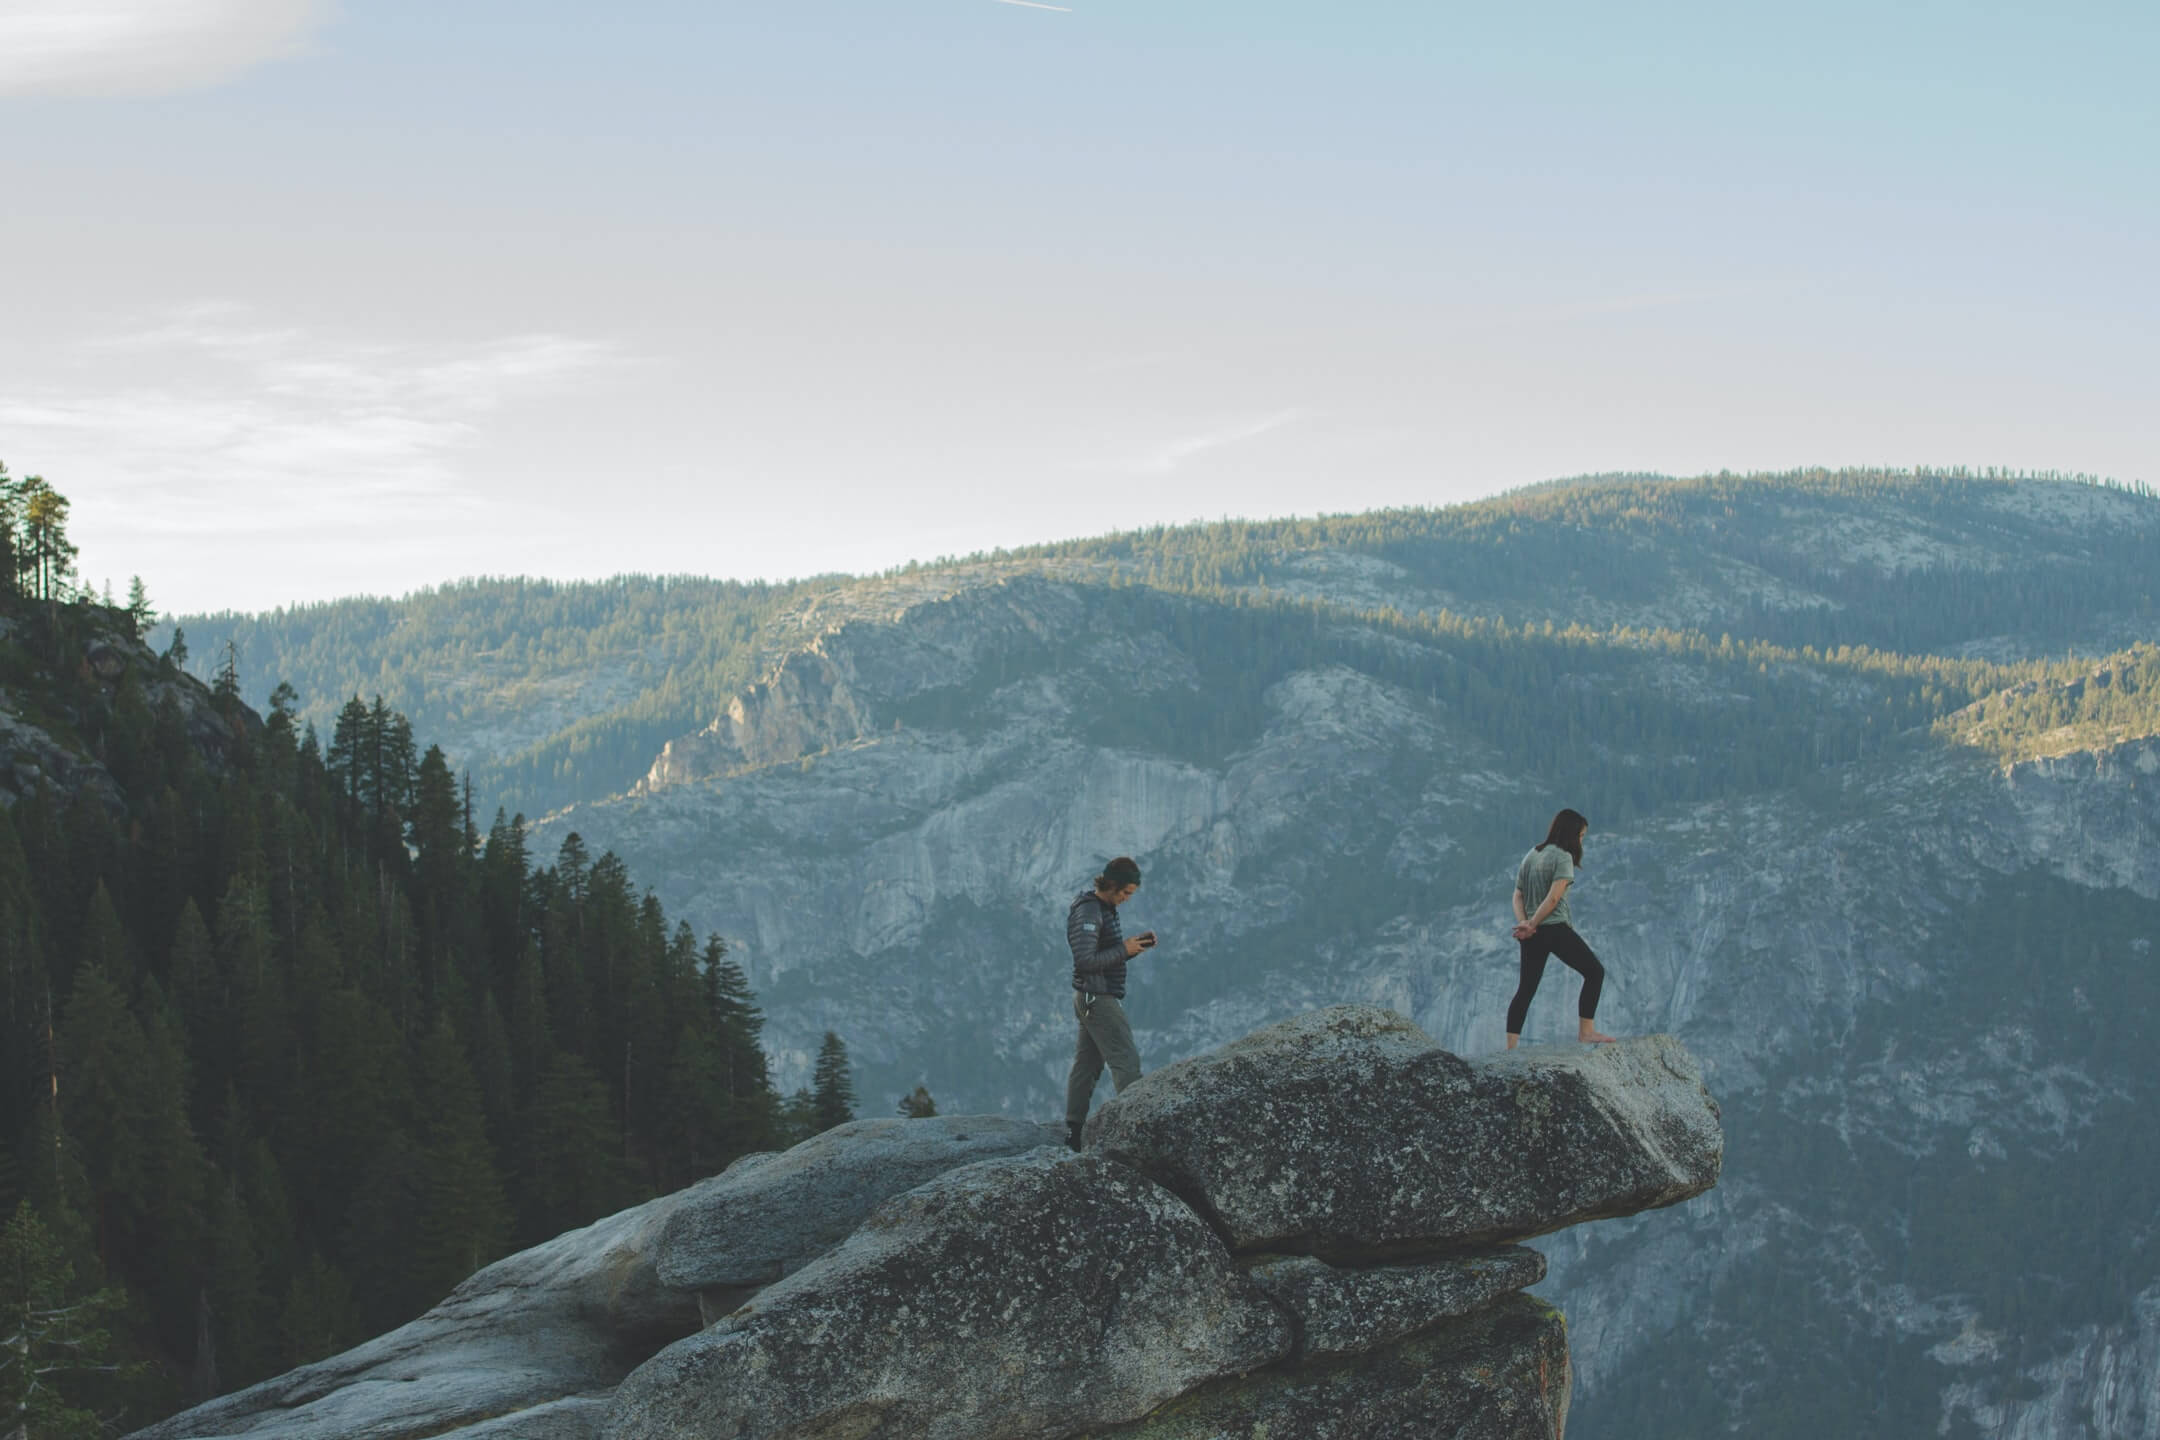 climbing is an adventure sport in spain